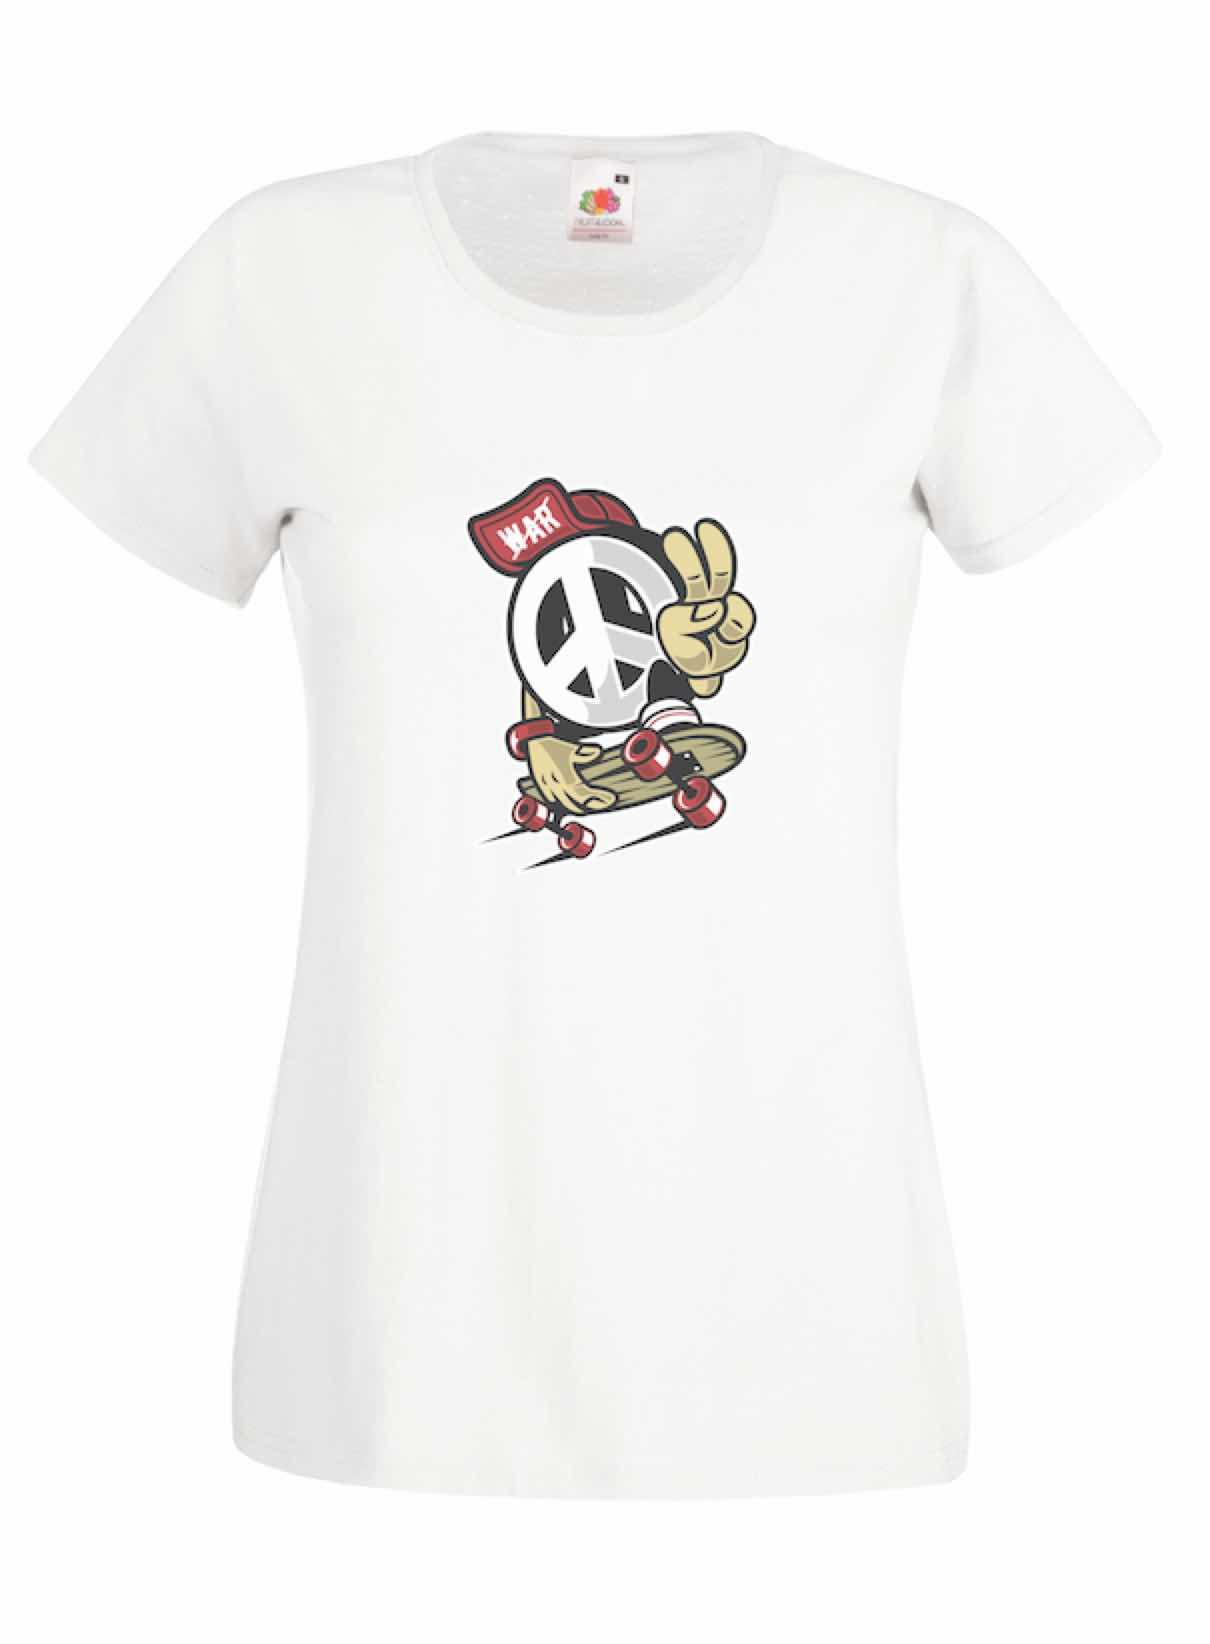 Peace Skate design for t-shirt, hoodie & sweatshirt